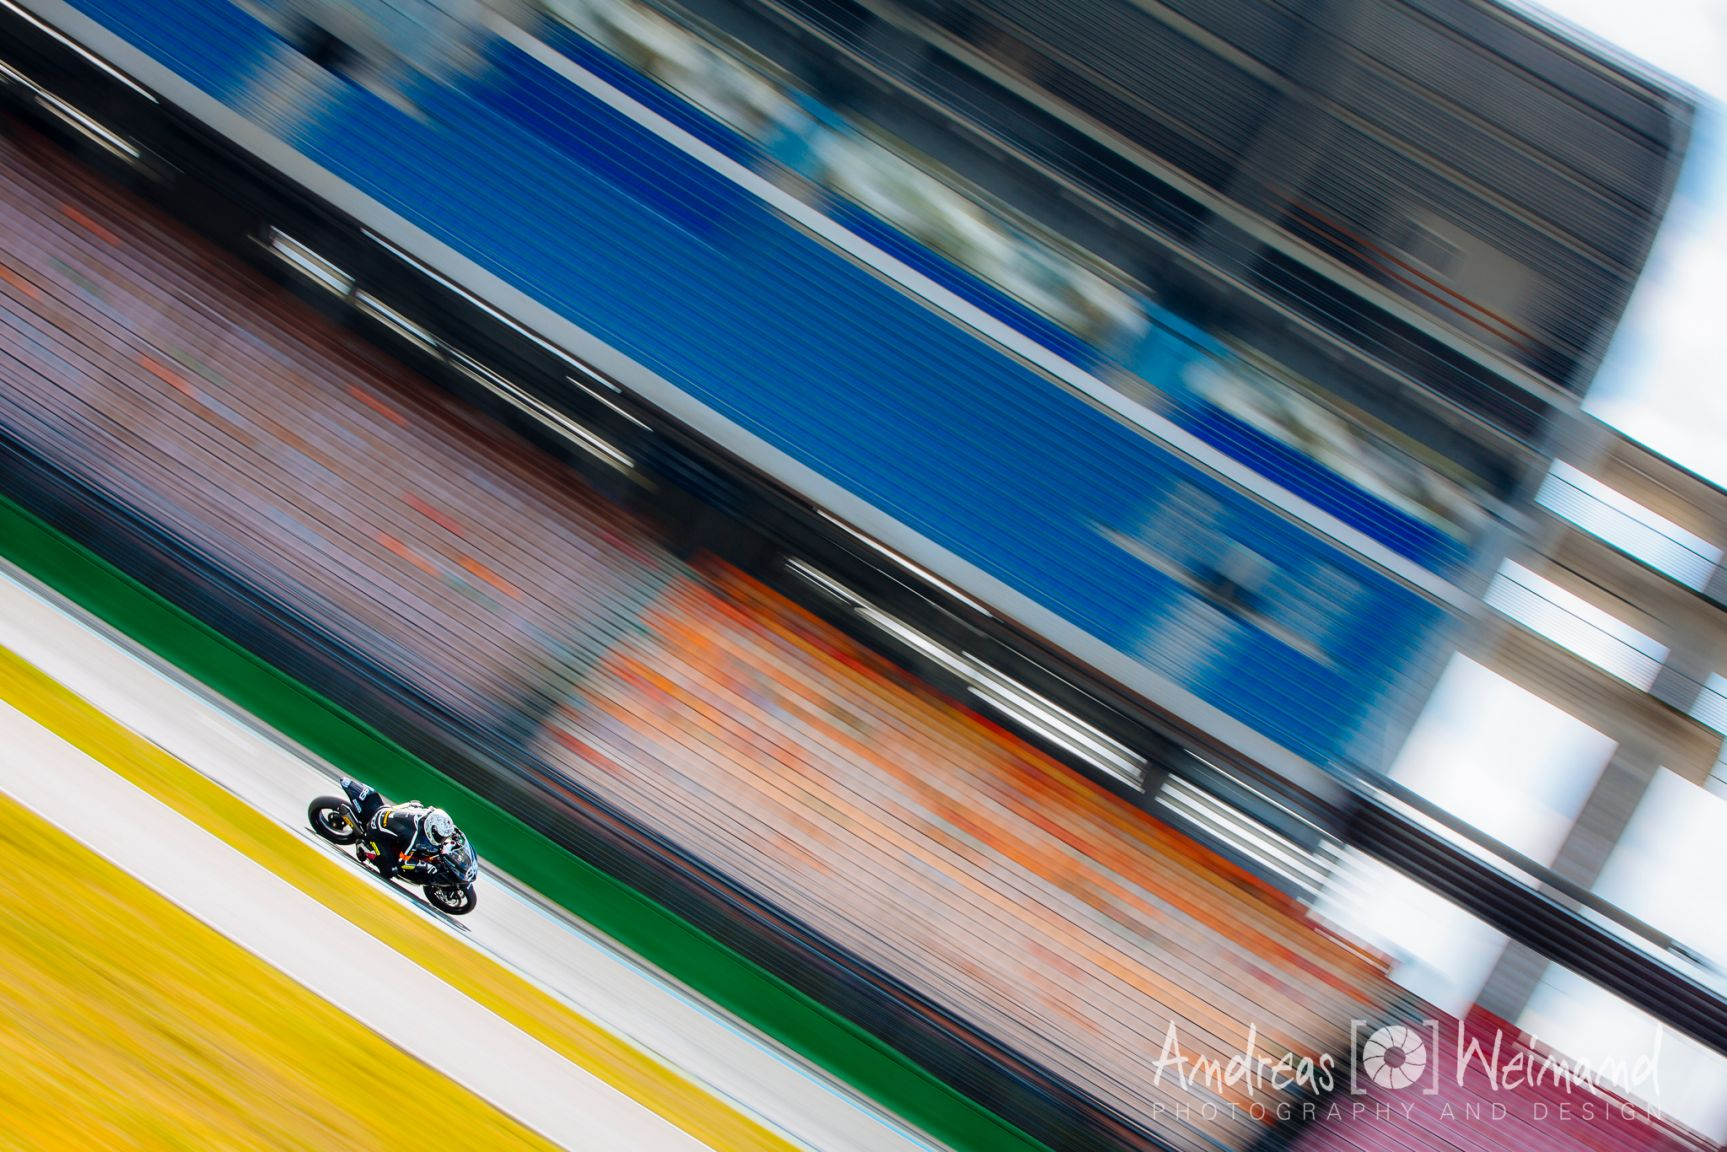 motorsport-reportage-ps-magazin-rennsport-teamfotos